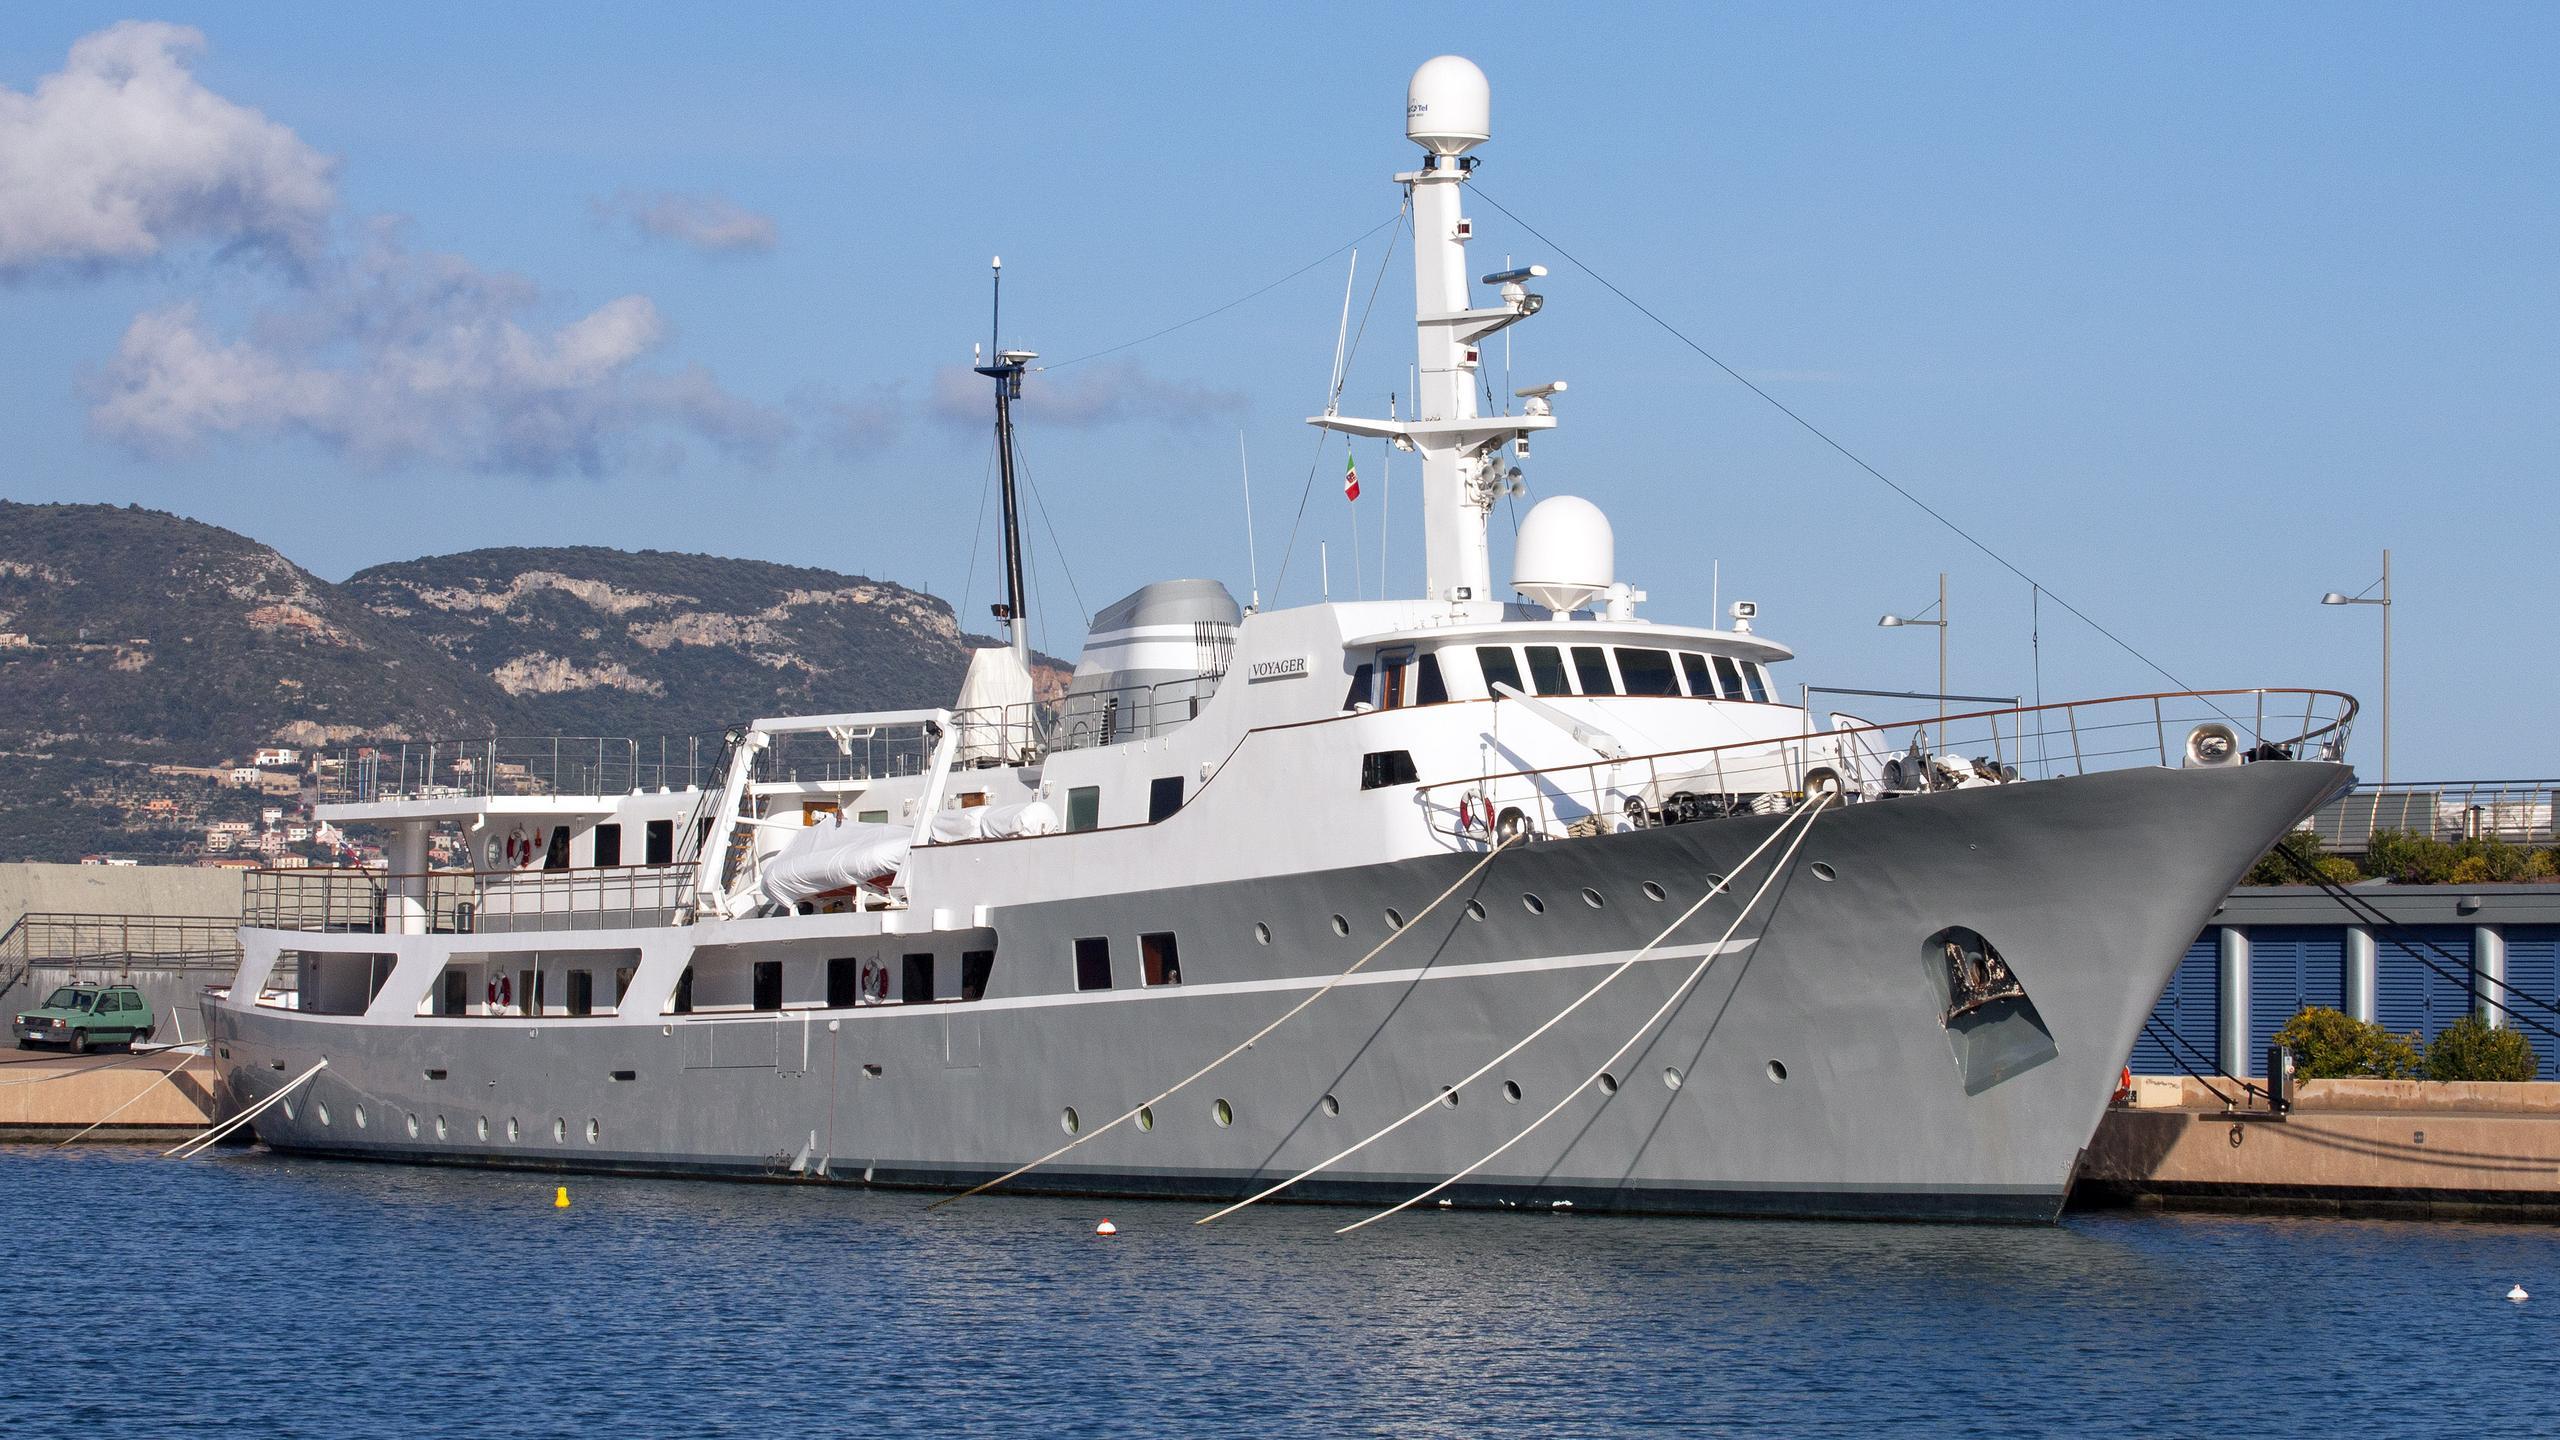 voyager-explorer-yacht-celaya-1973-62m-half-profile